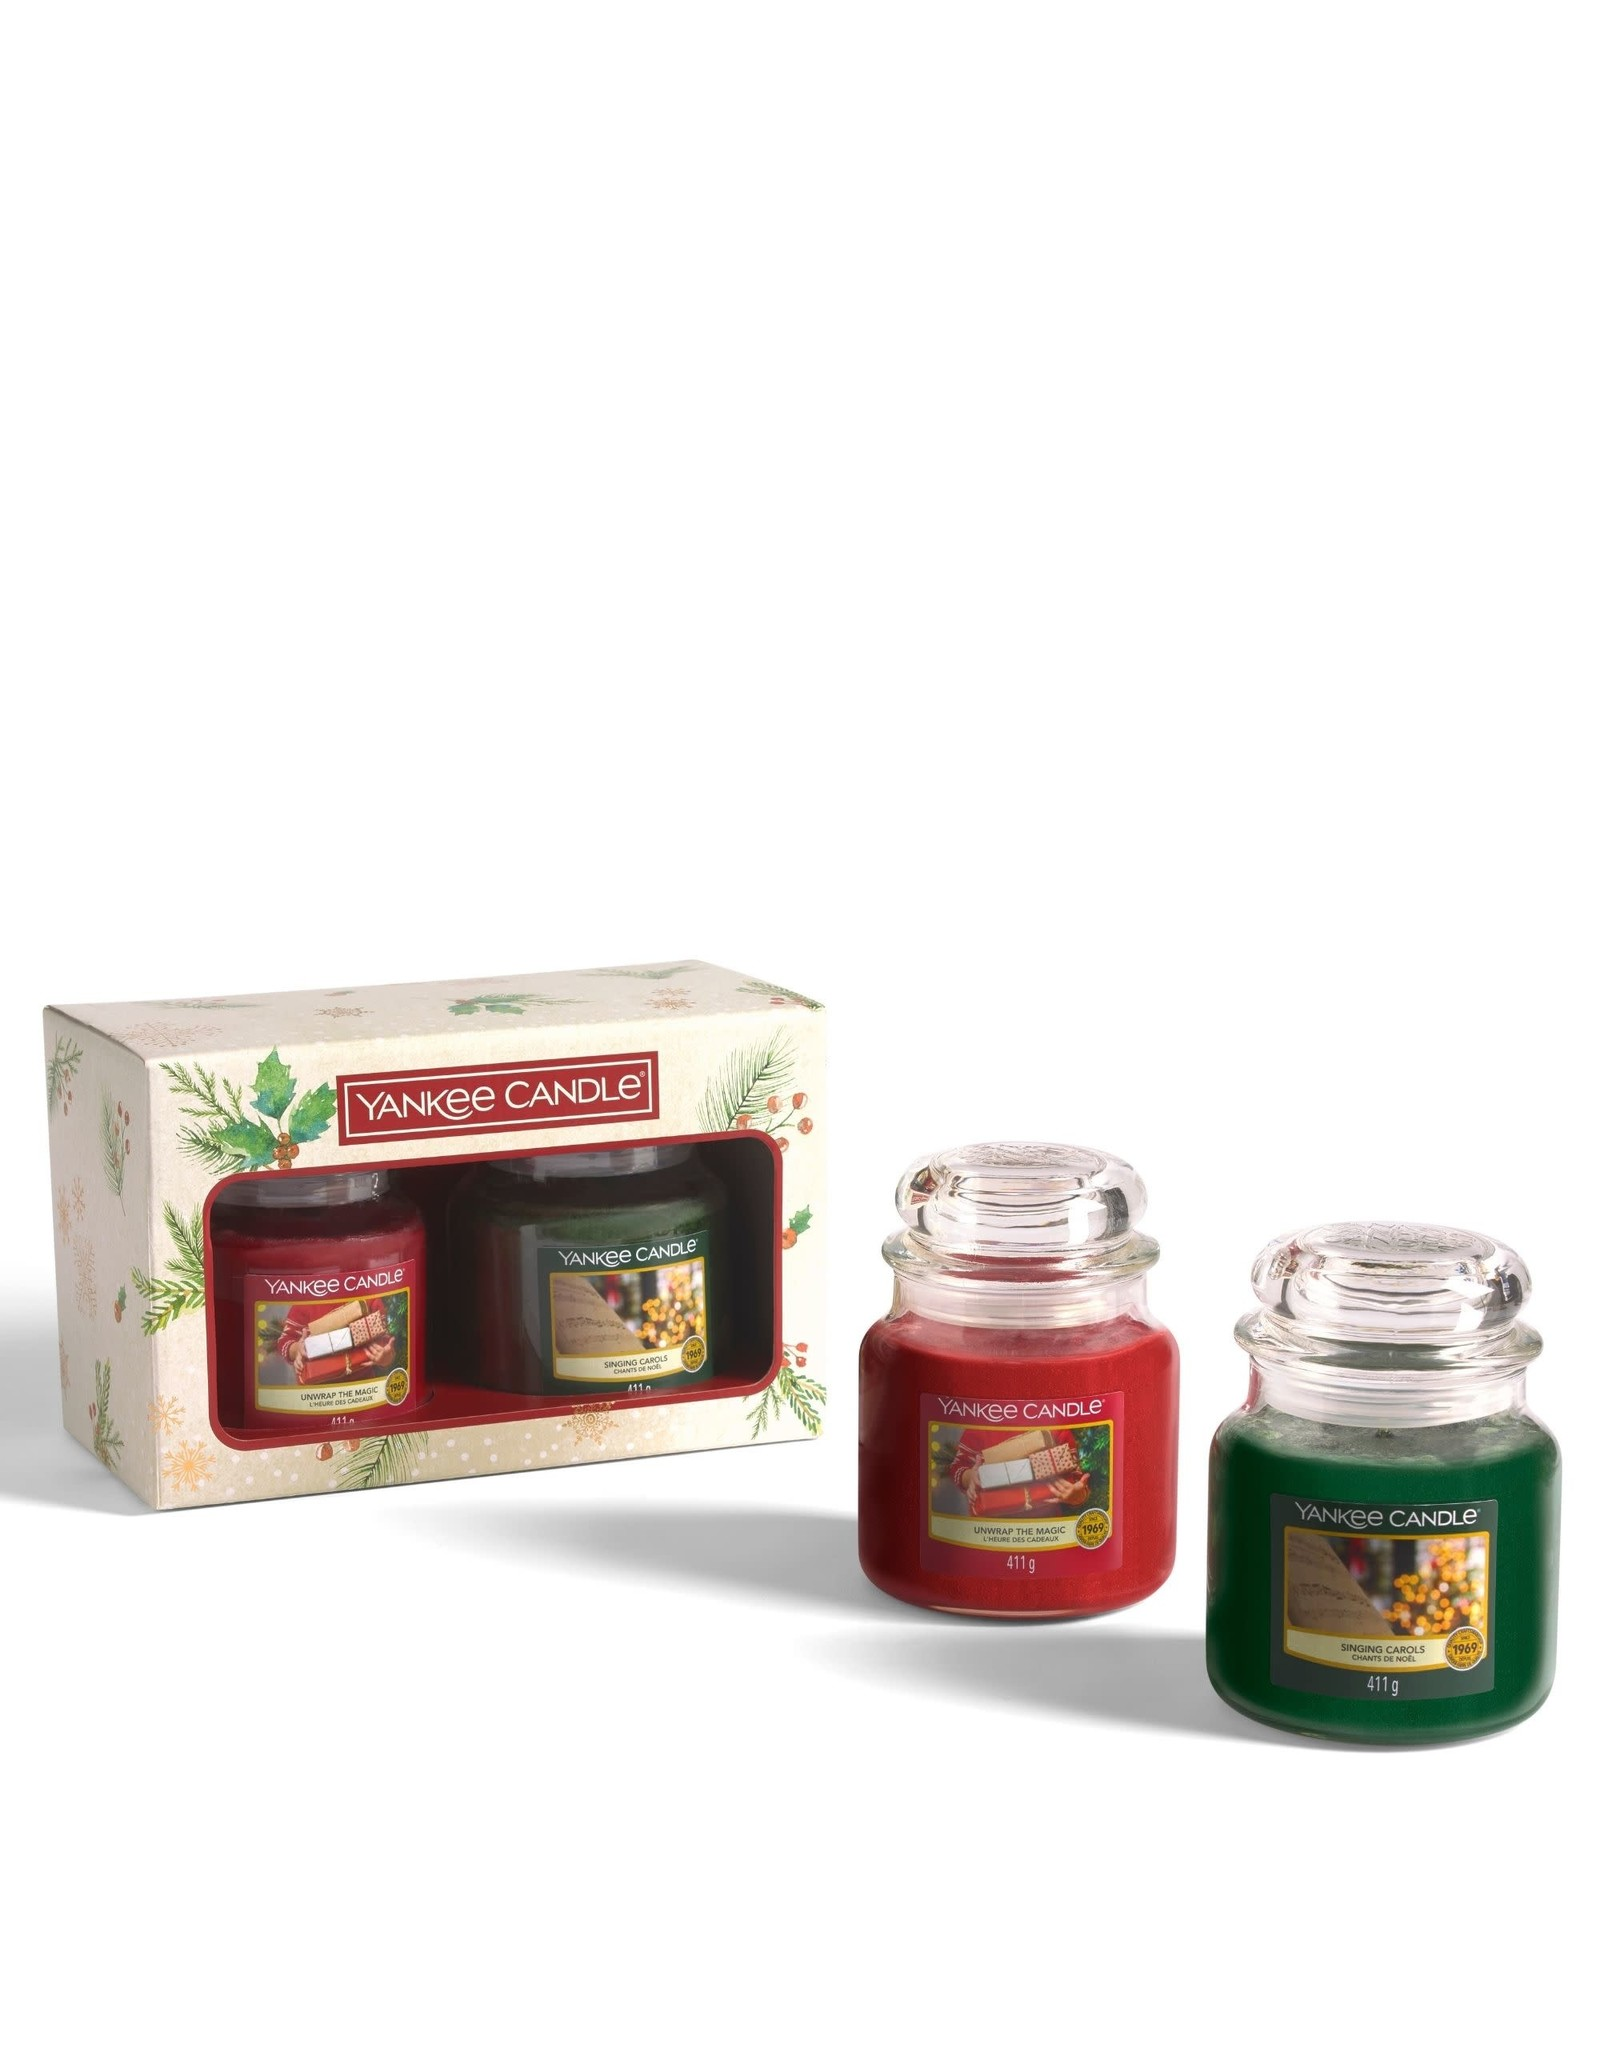 Yankee Candle Magical Christmas Morning - 2 Medium Jars Giftset